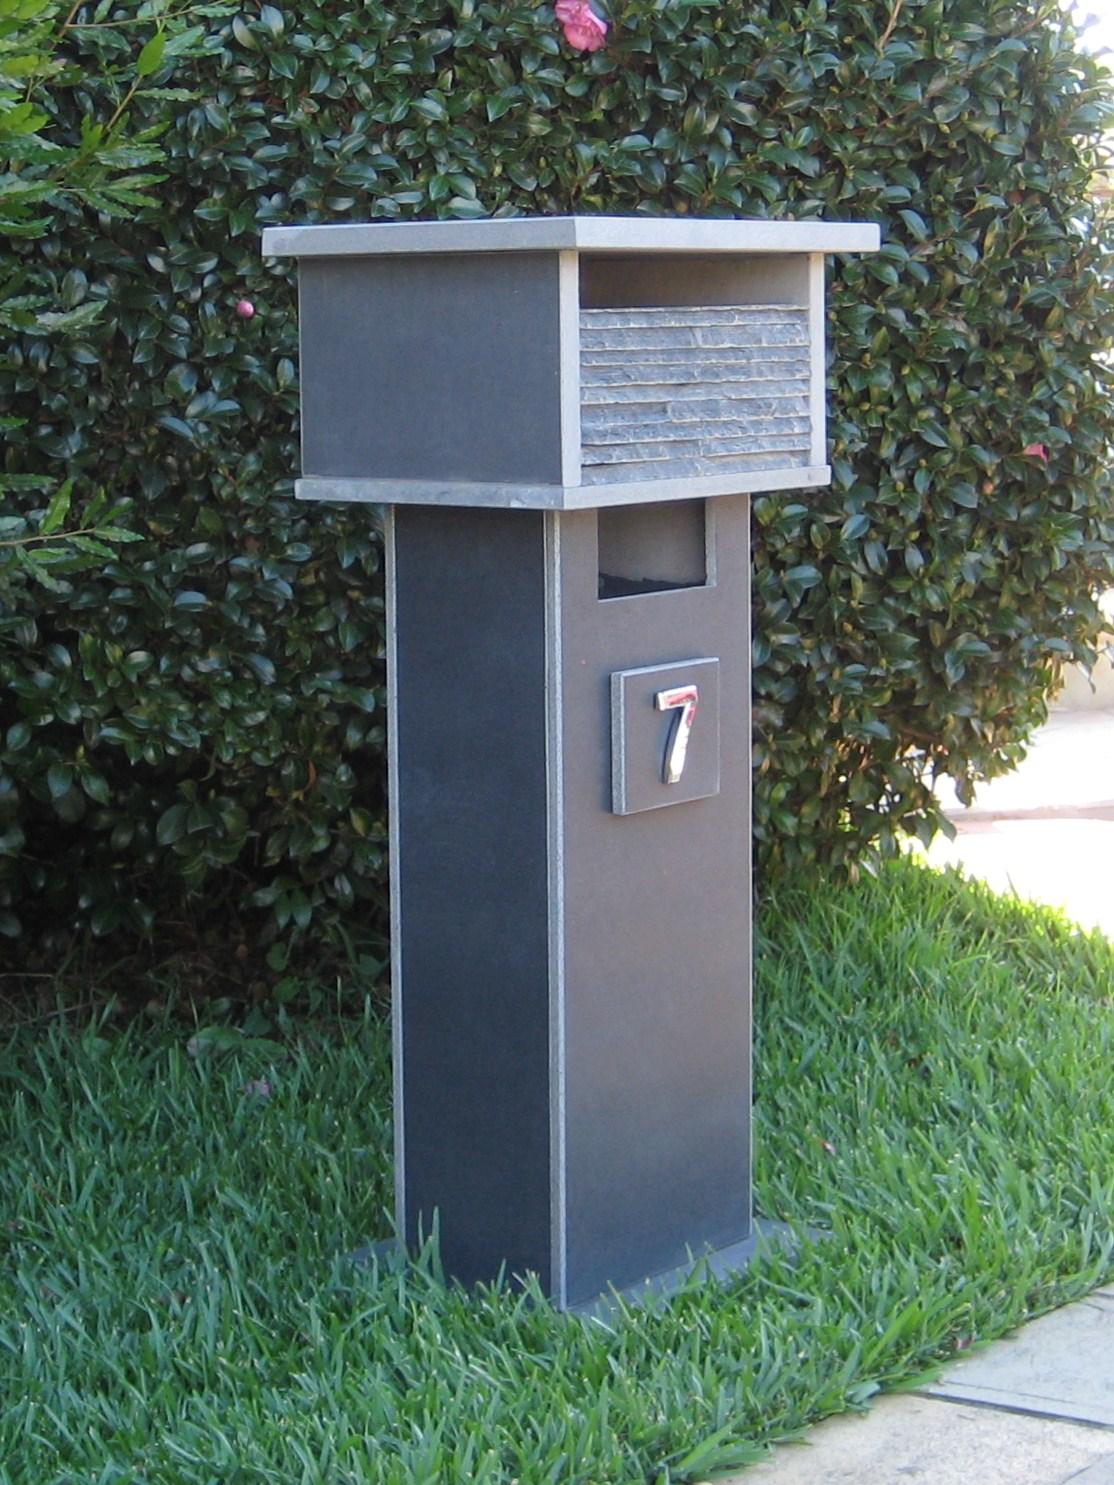 7. Bluestone letterbox solid, aluminium back door with 2 key lock 860cm high top part mesure 300mm x 400mm. $650